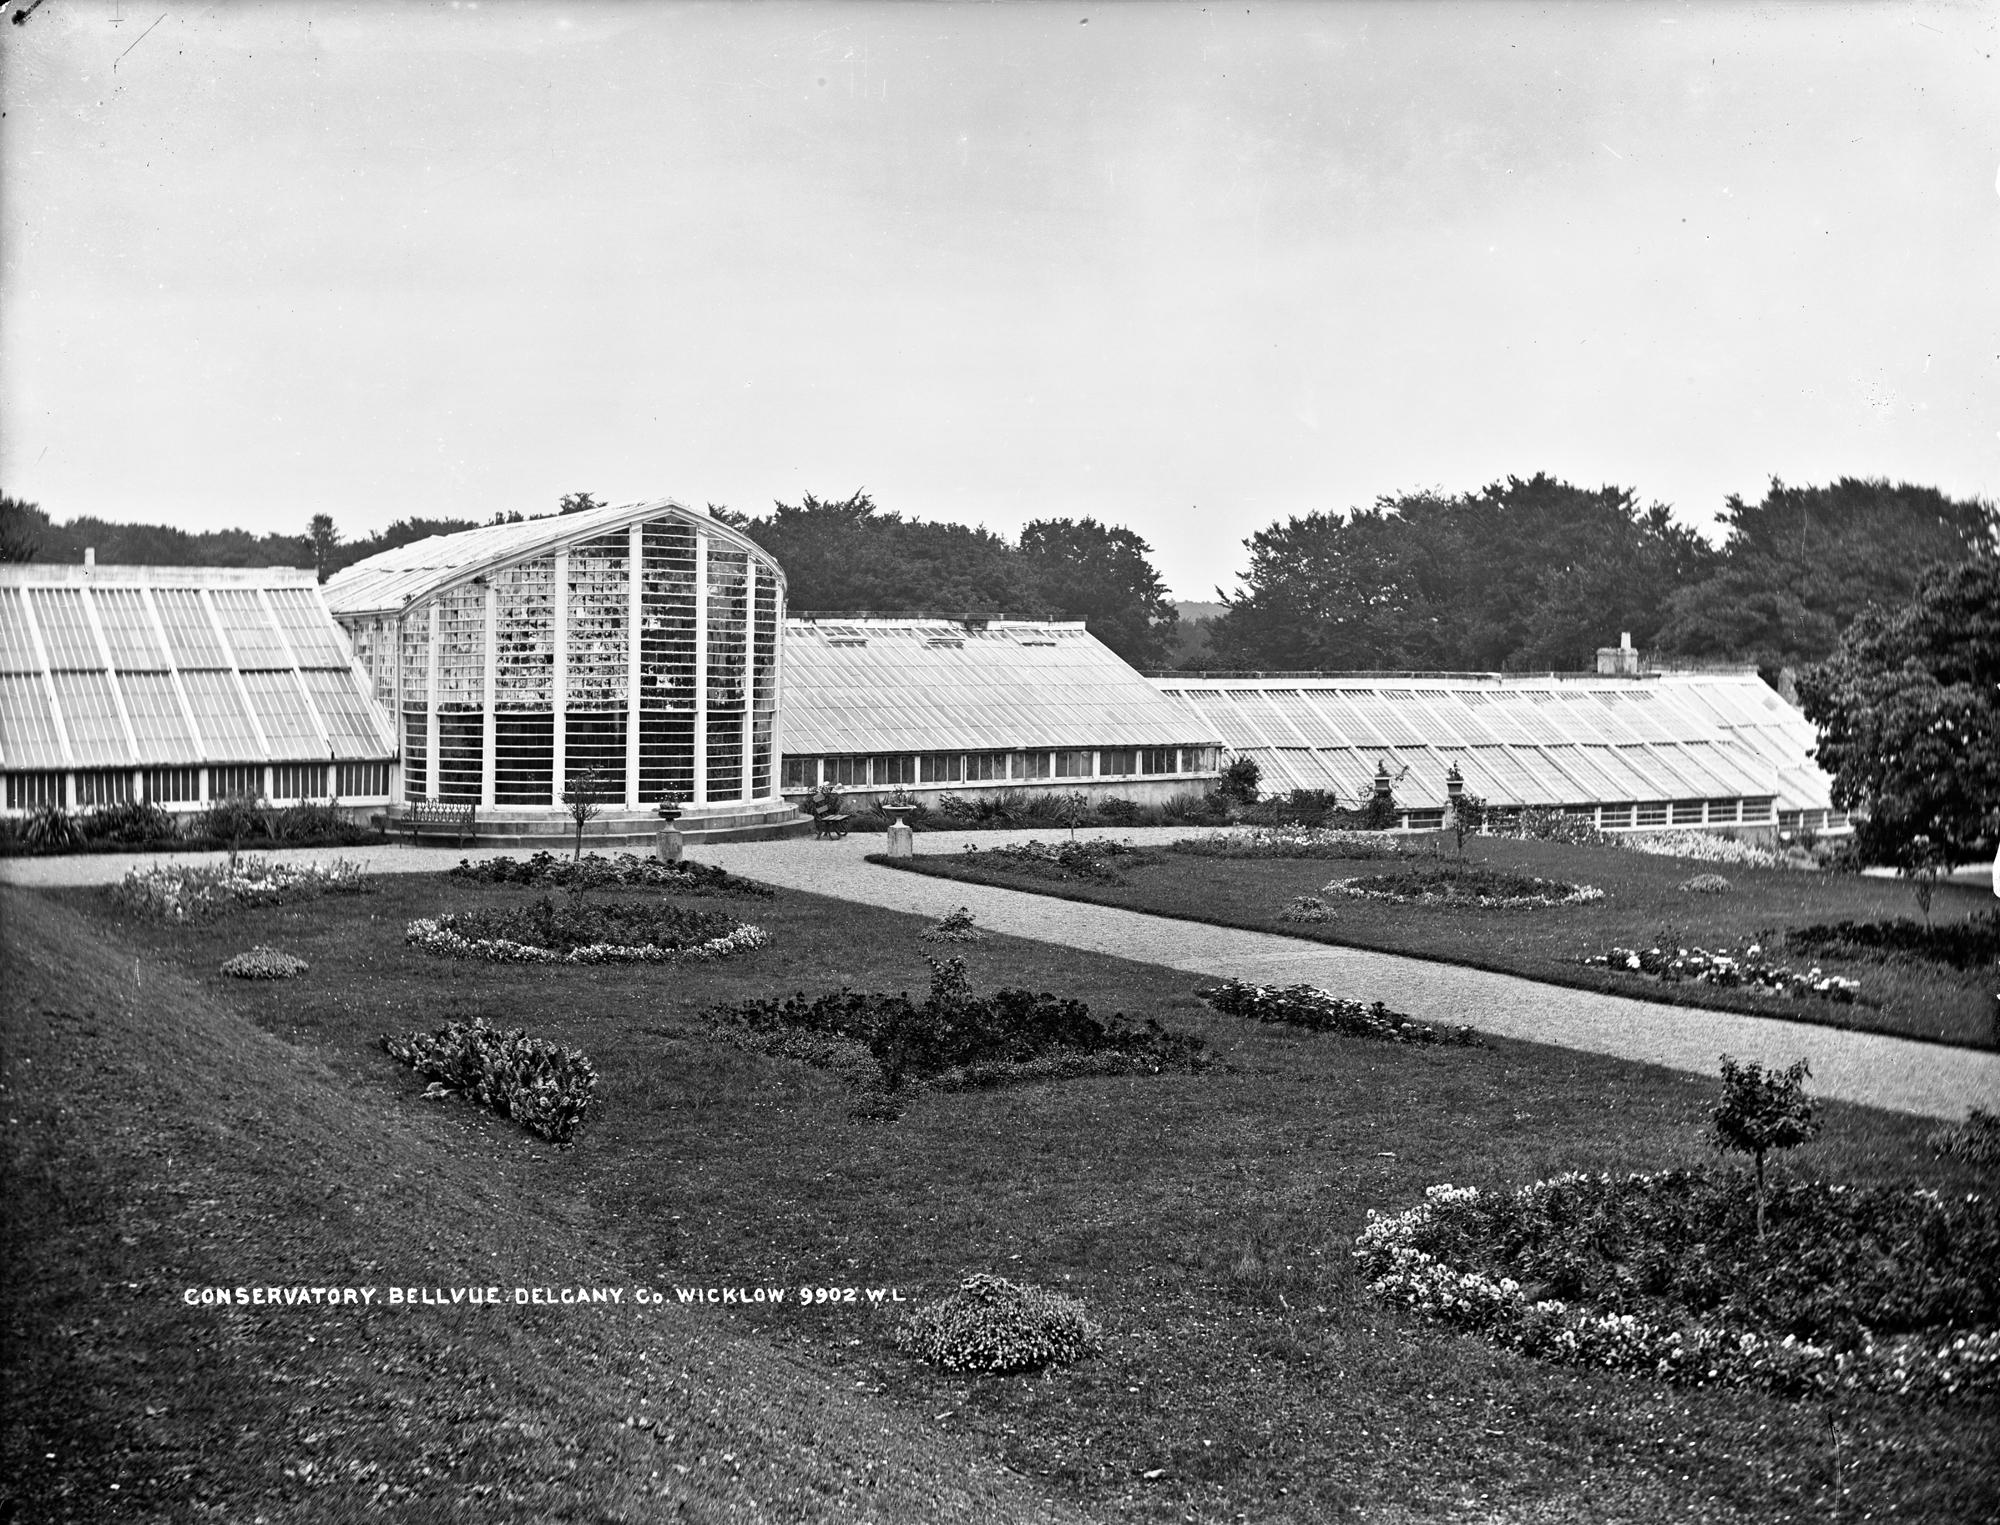 Bellevue Conservatory, Delgany, Co. Wicklow